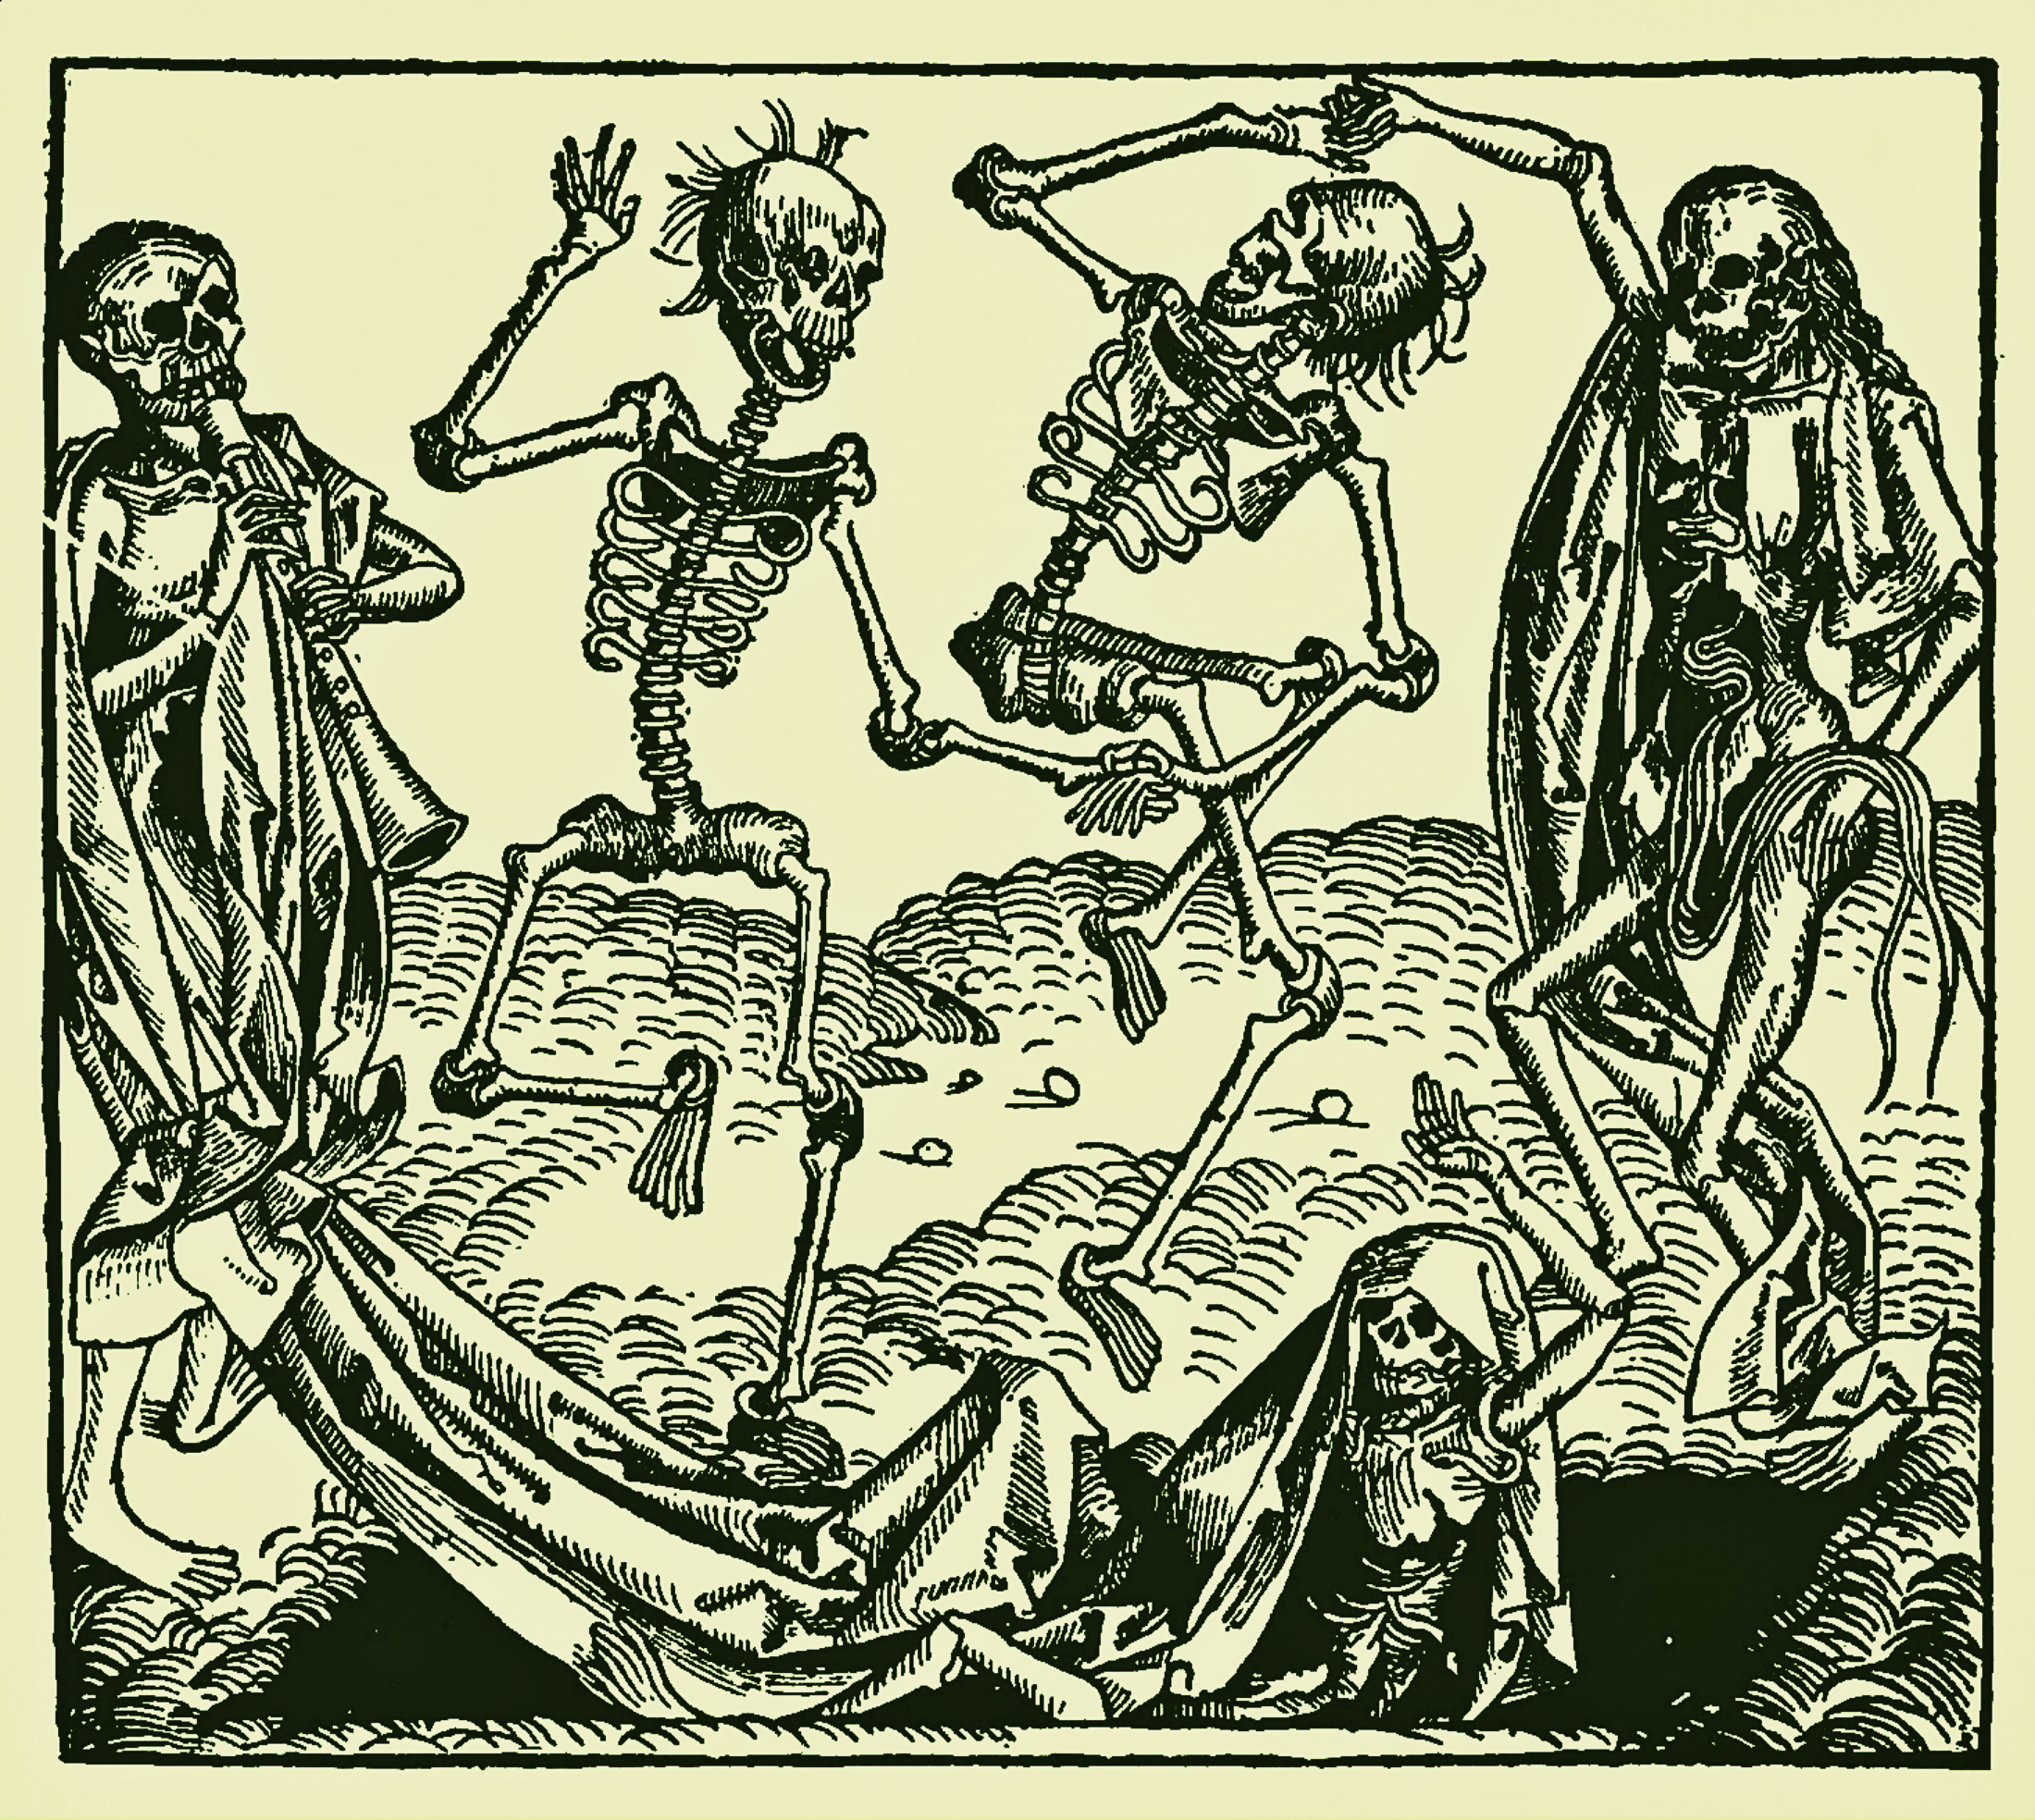 https://seanchase.files.wordpress.com/2019/02/danse-macabre-wolgemut-1493.jpg